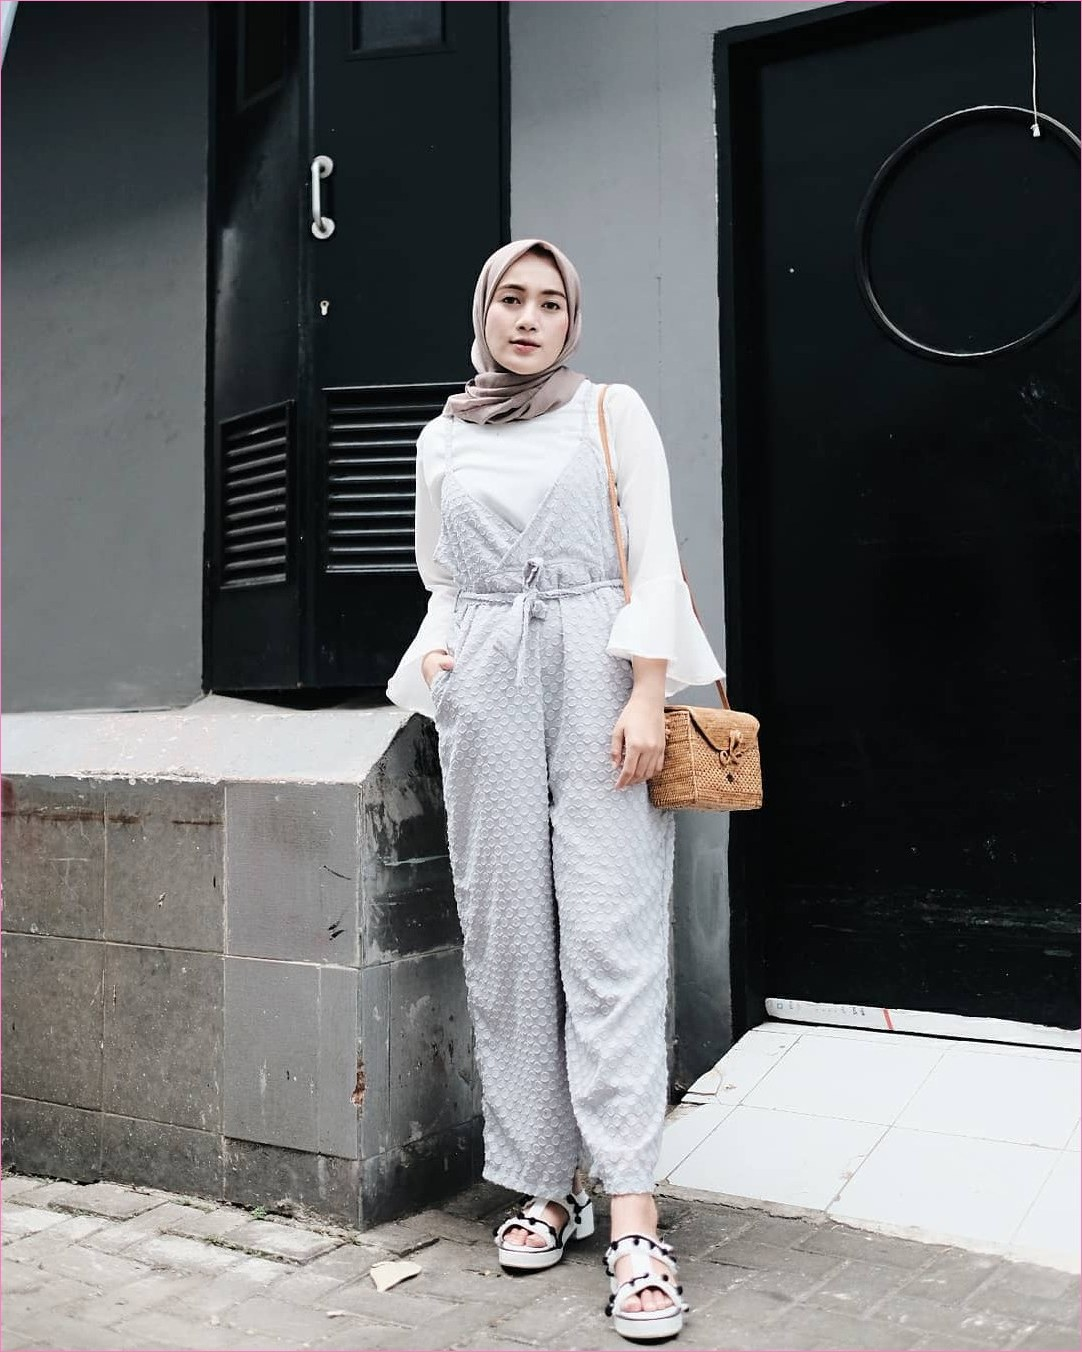 Design Baju Lebaran Ala Selebgram Thdr 17 Gaya Outfit Baju Jumpsuit Berhijab Ala Selebgram 2019